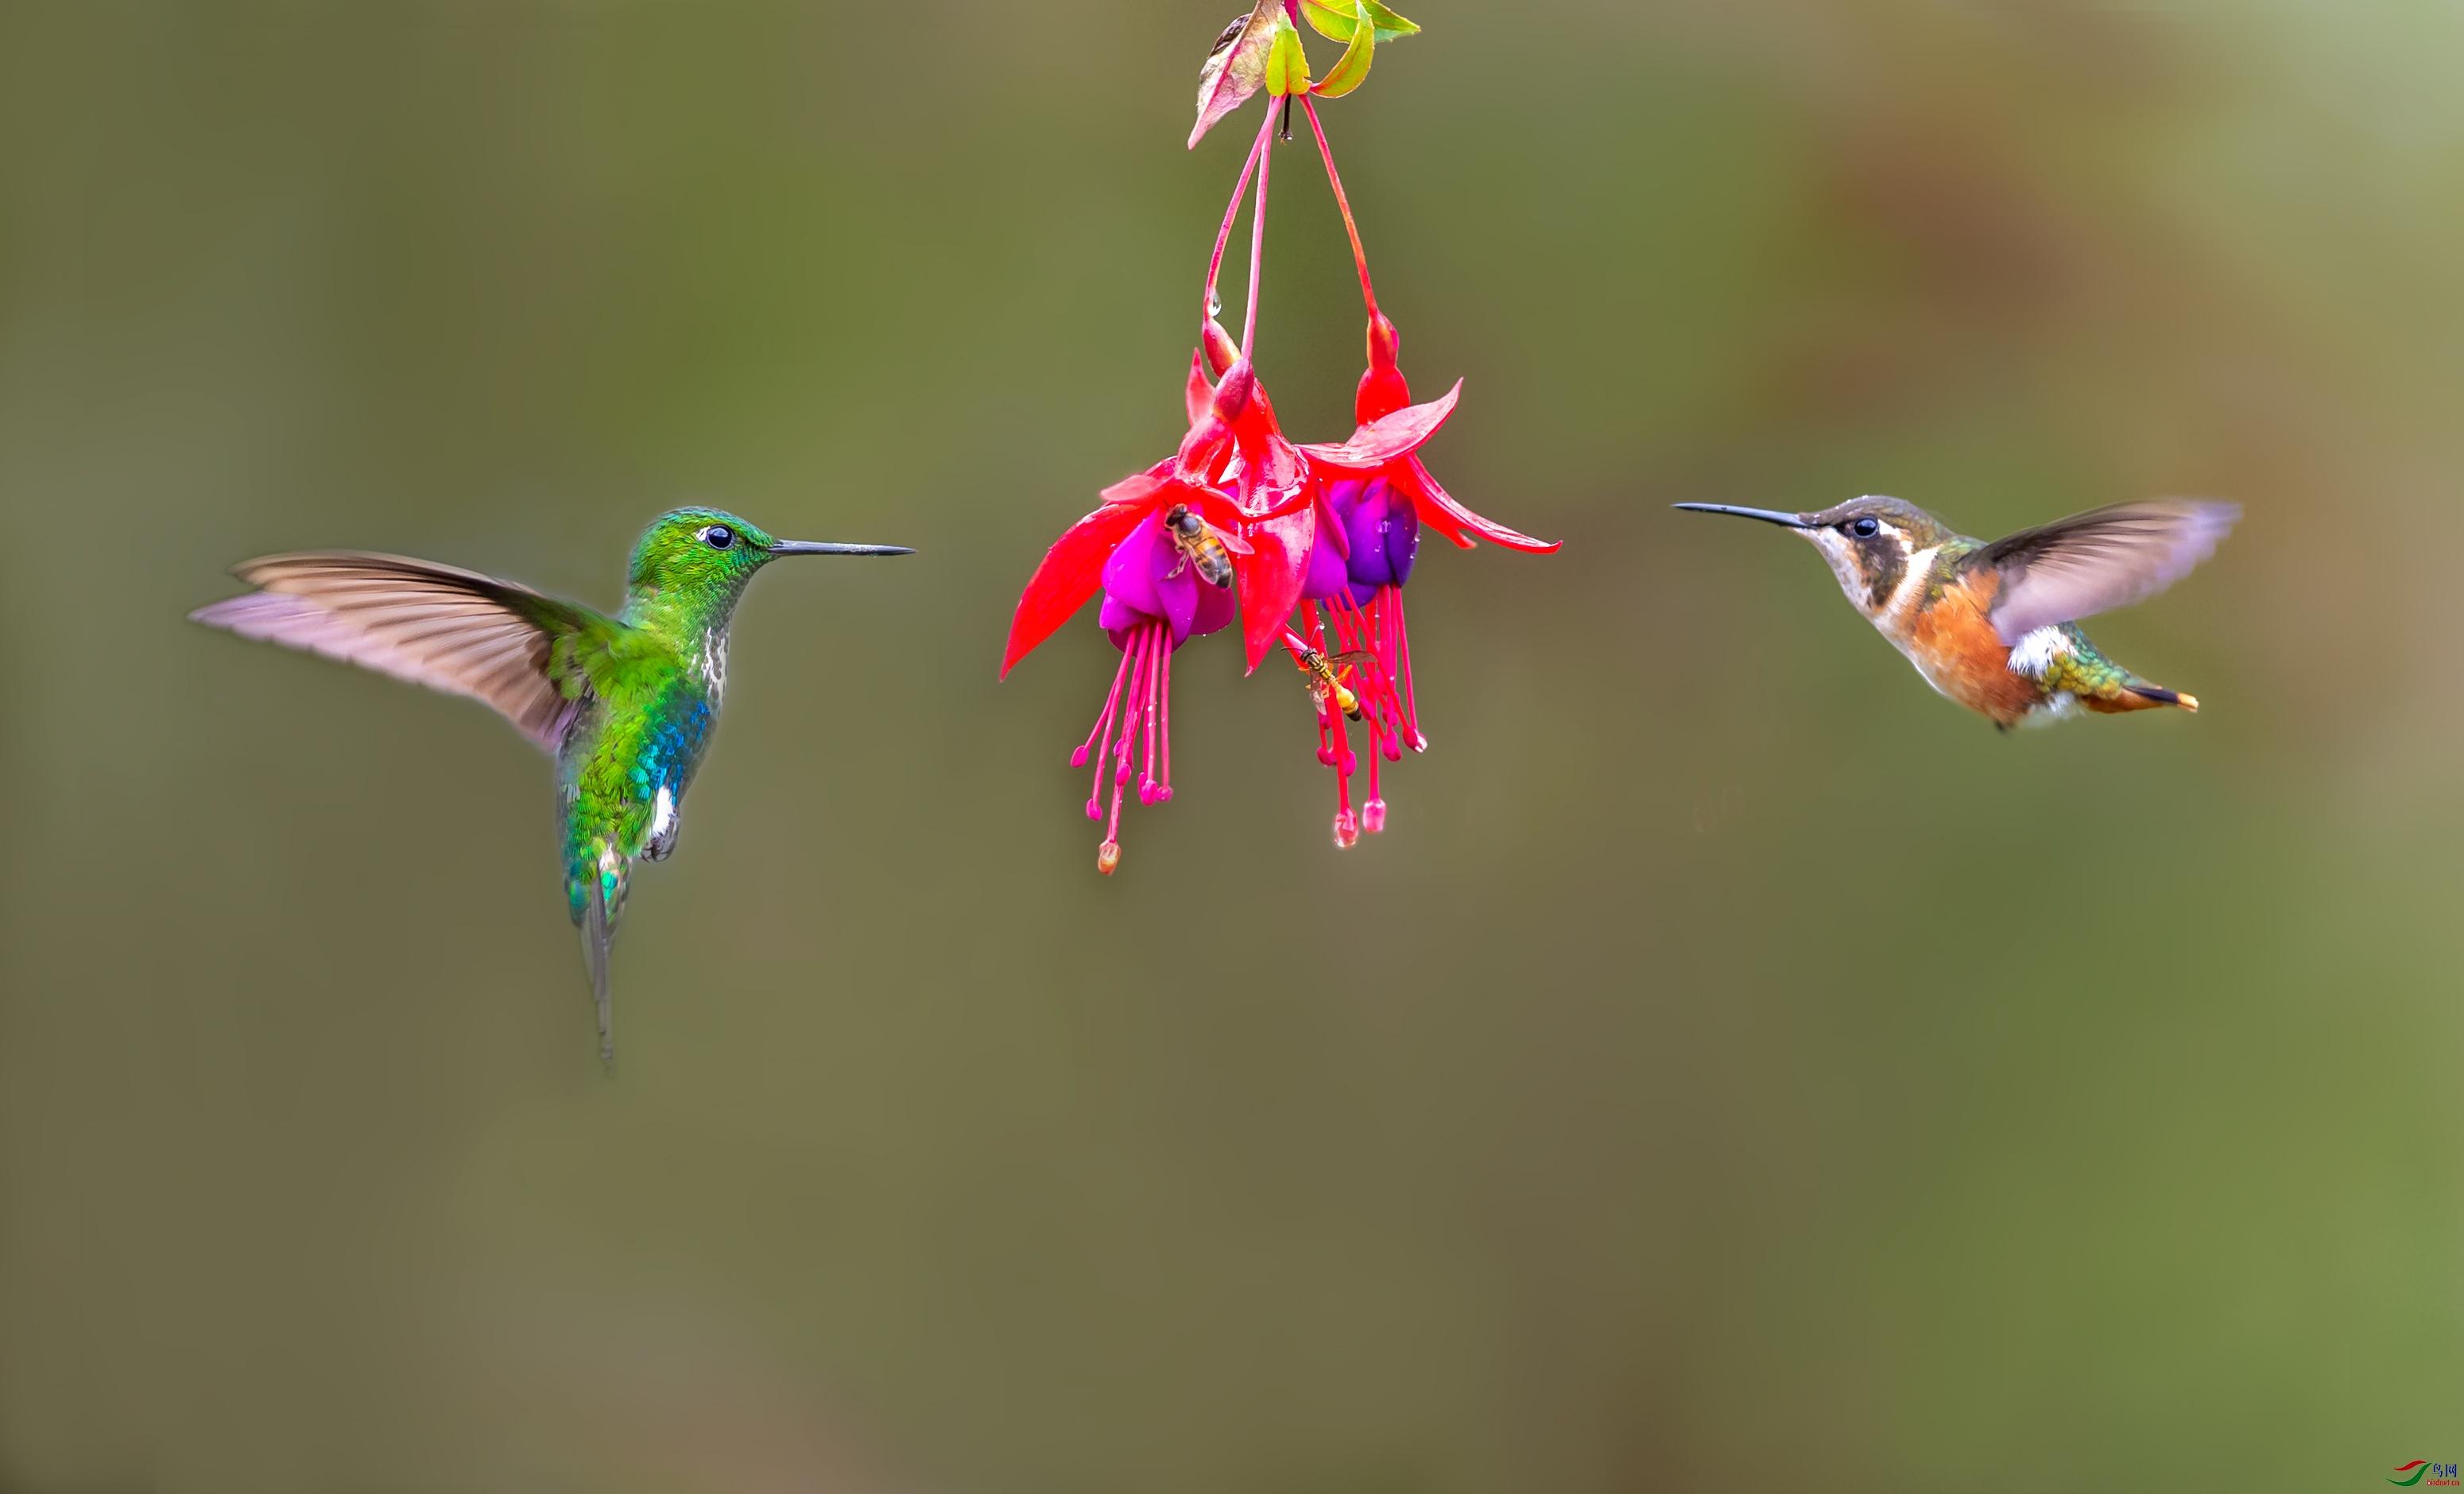 23_WZW5933-w翠腹毛腿蜂鸟、白腹林蜂鸟(雌).jpg